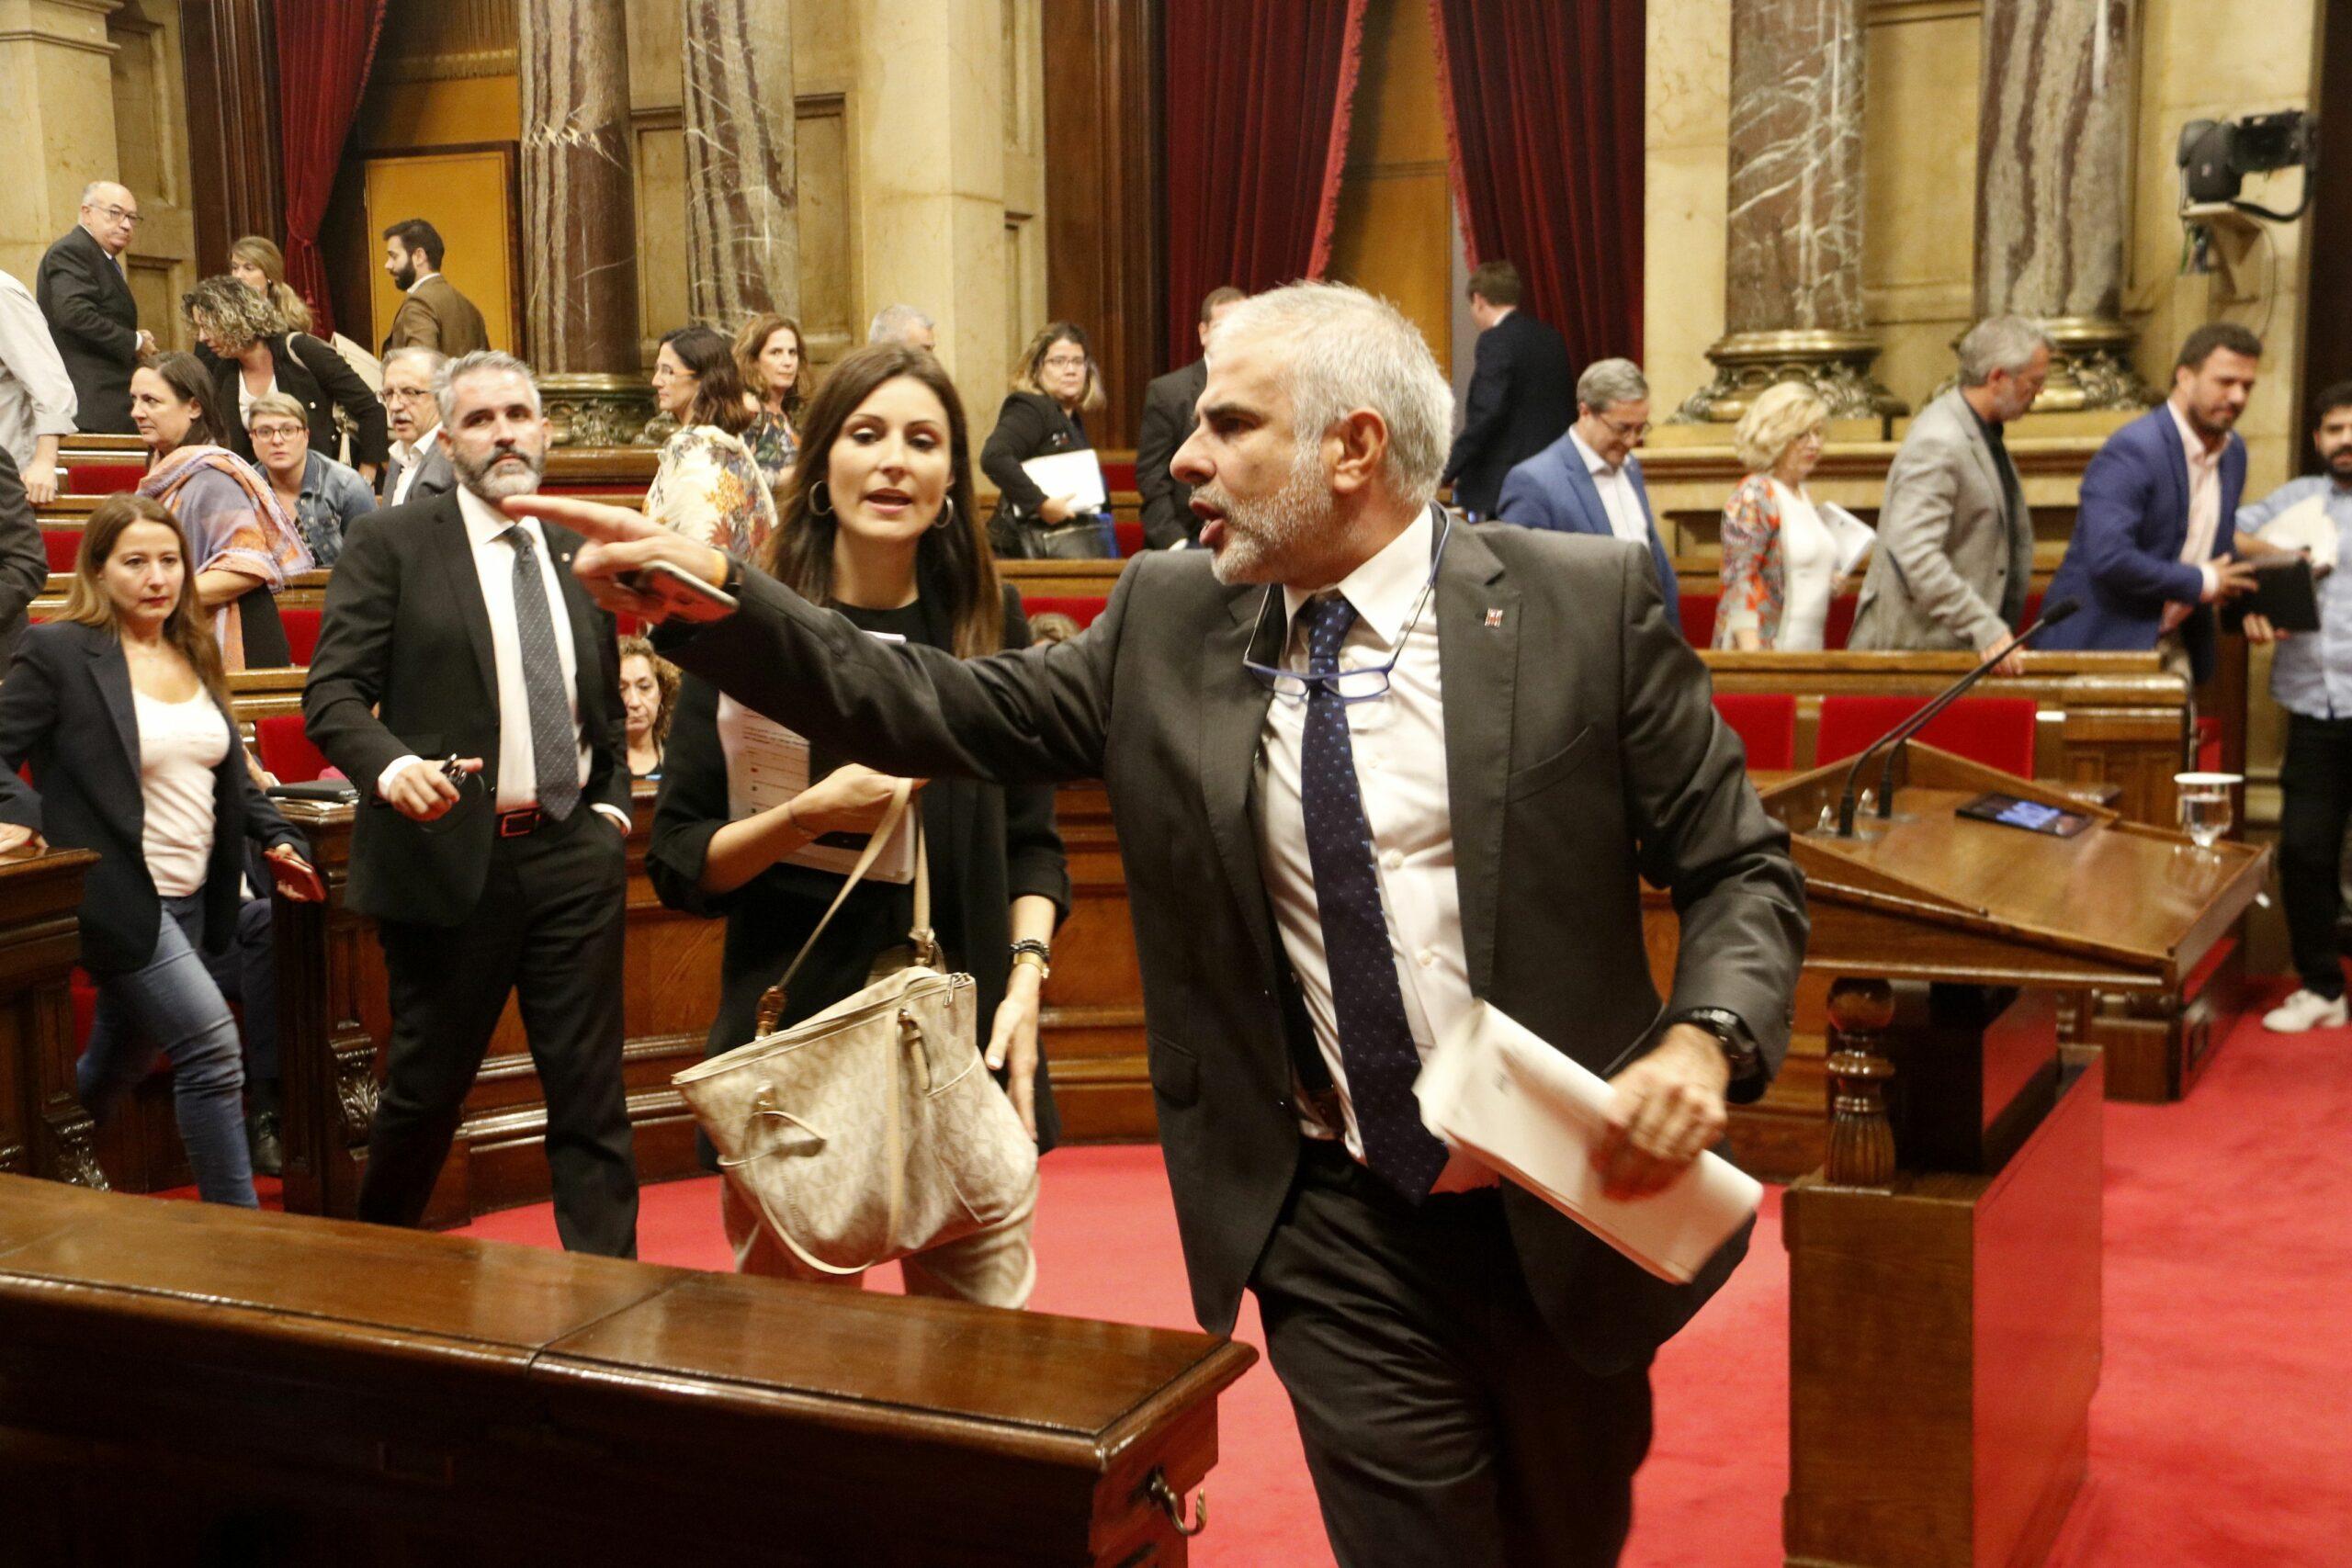 Carlos Carrizosa i Lorena Roldán abandonen l'hemicicle en el passat ple (ACN)